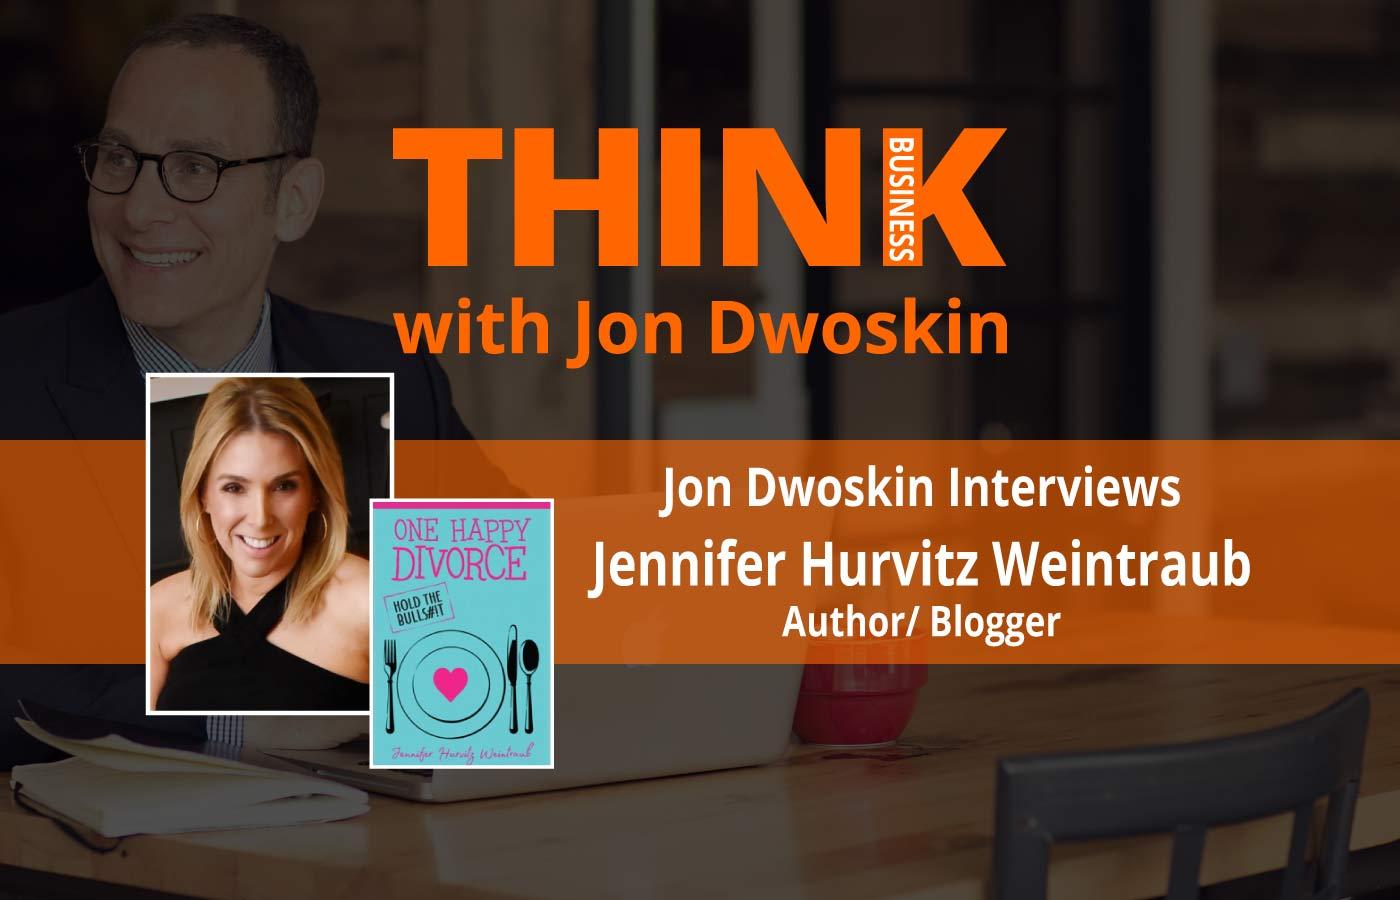 THINK Business Podcast: Jon Dwoskin Interviews Jennifer Hurvitz Weintraub